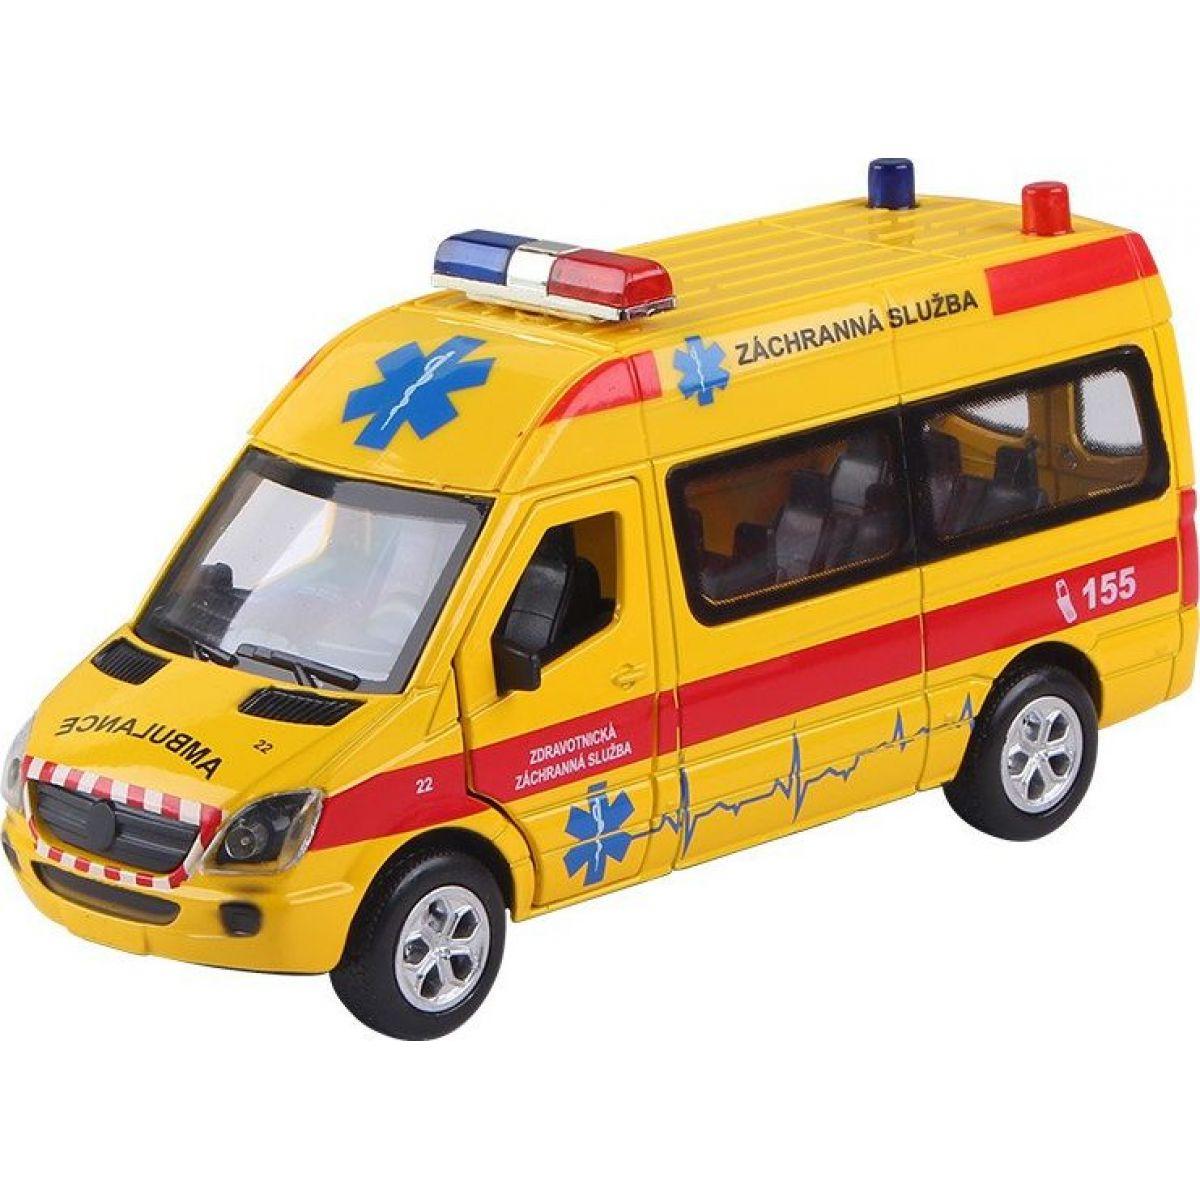 HM Studio Záchranáři Mercedes-Benz 1:32